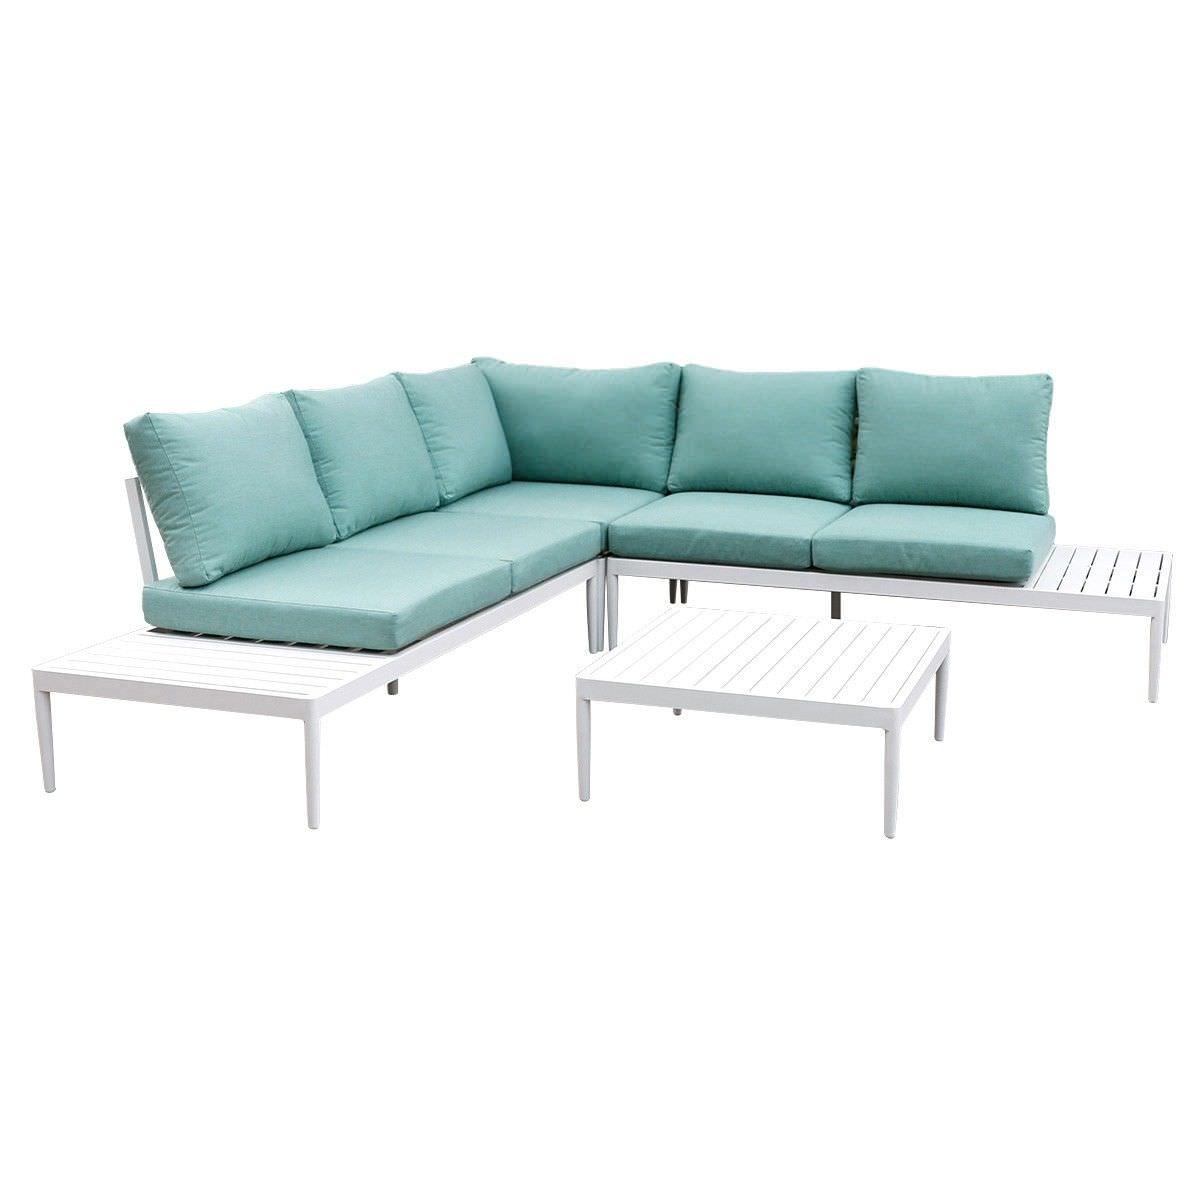 coogee 4 piece aluminium outdoor lounge set. Black Bedroom Furniture Sets. Home Design Ideas